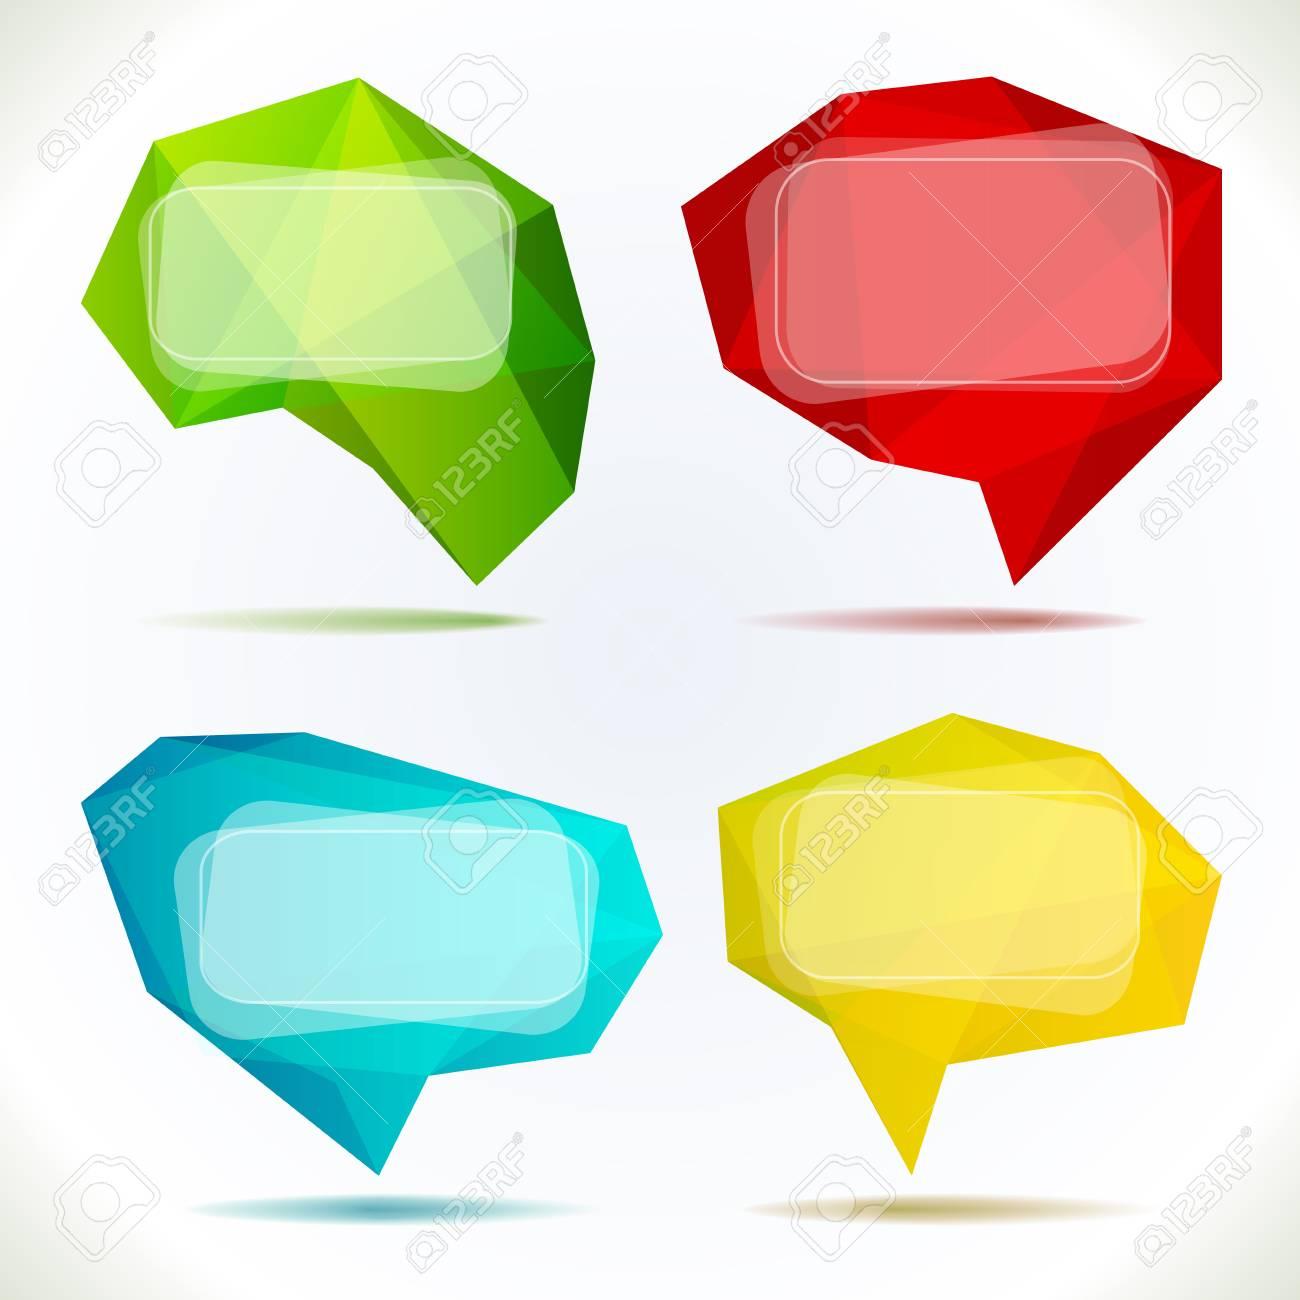 Set of Speech Bubbles isolated on white illustration Stock Vector - 15629170